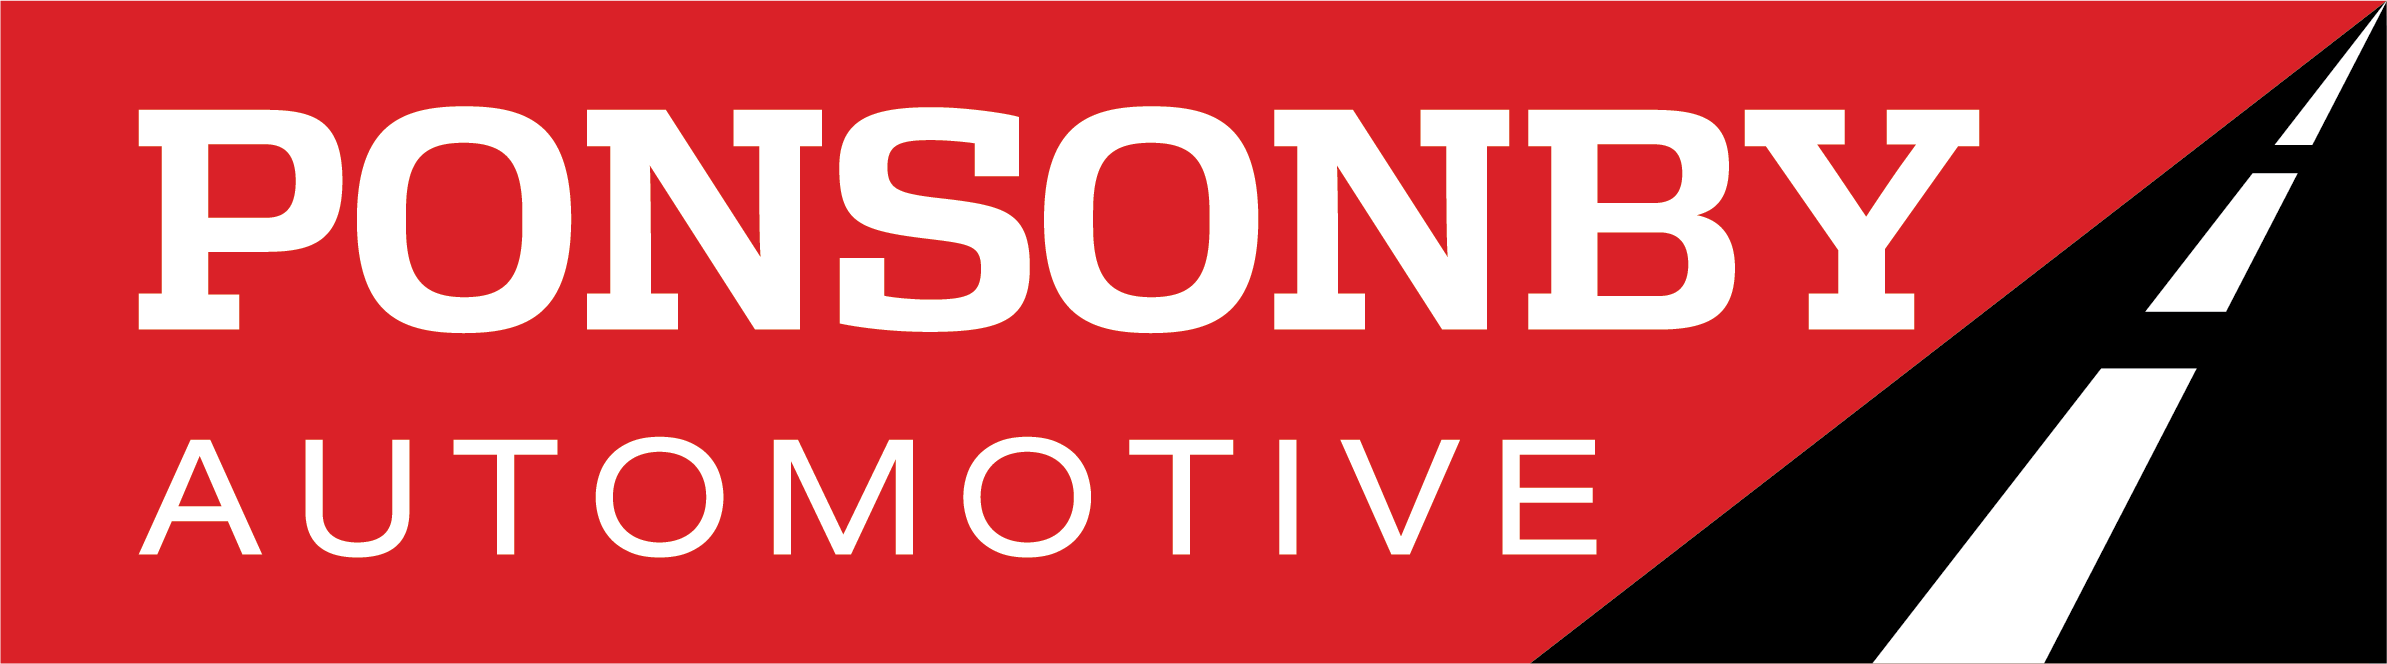 PonsonbyAutomotiveLogo.png